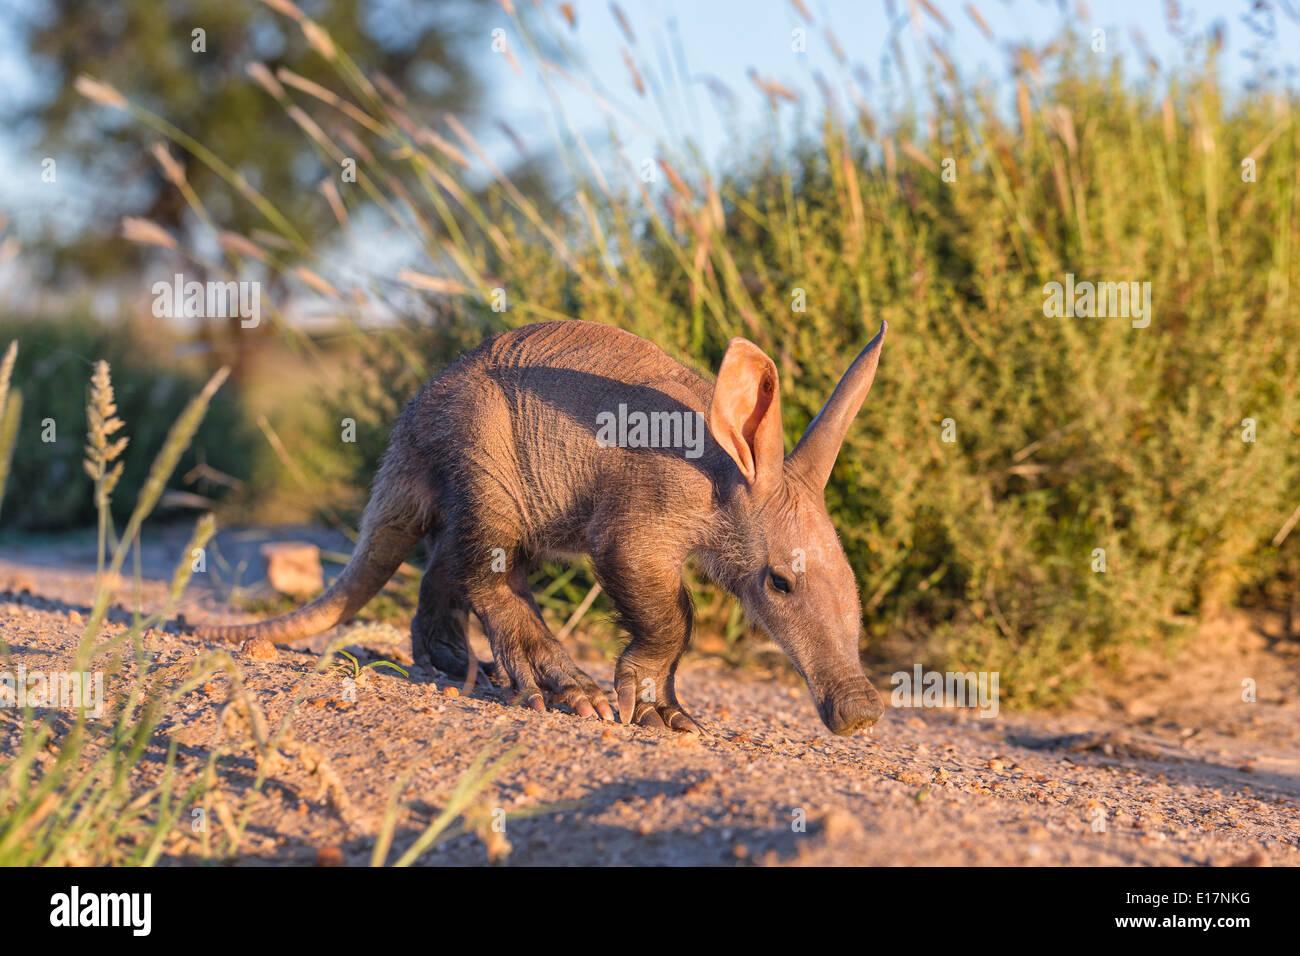 Les jeunes l'Oryctérope Orycteropus afer)(.La Namibie Photo Stock